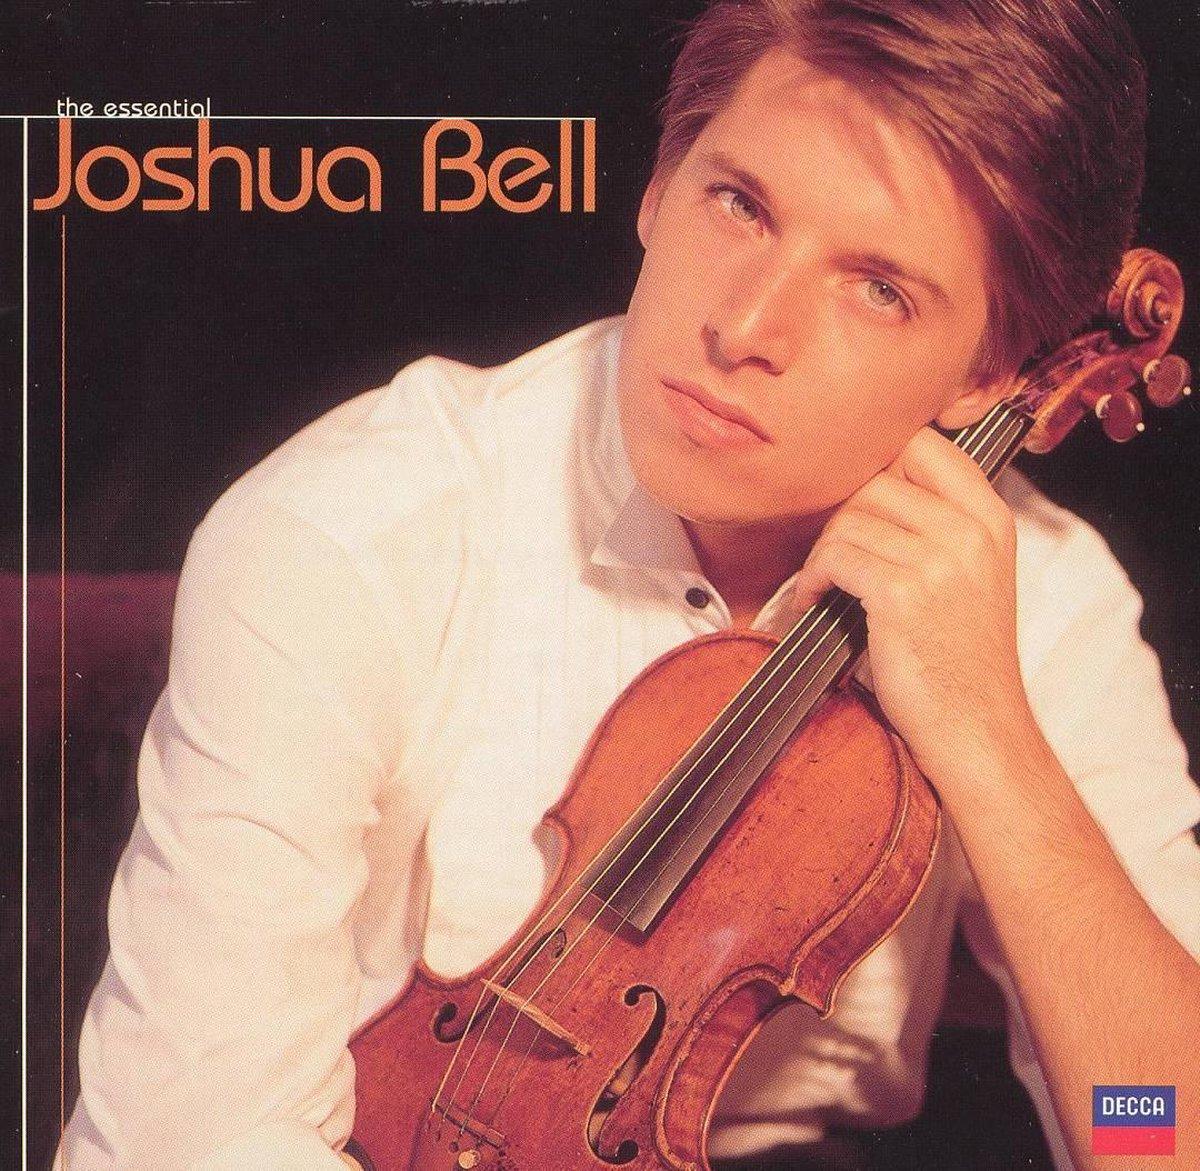 Essential Joshua Bell [Decca] - Joshua Bell